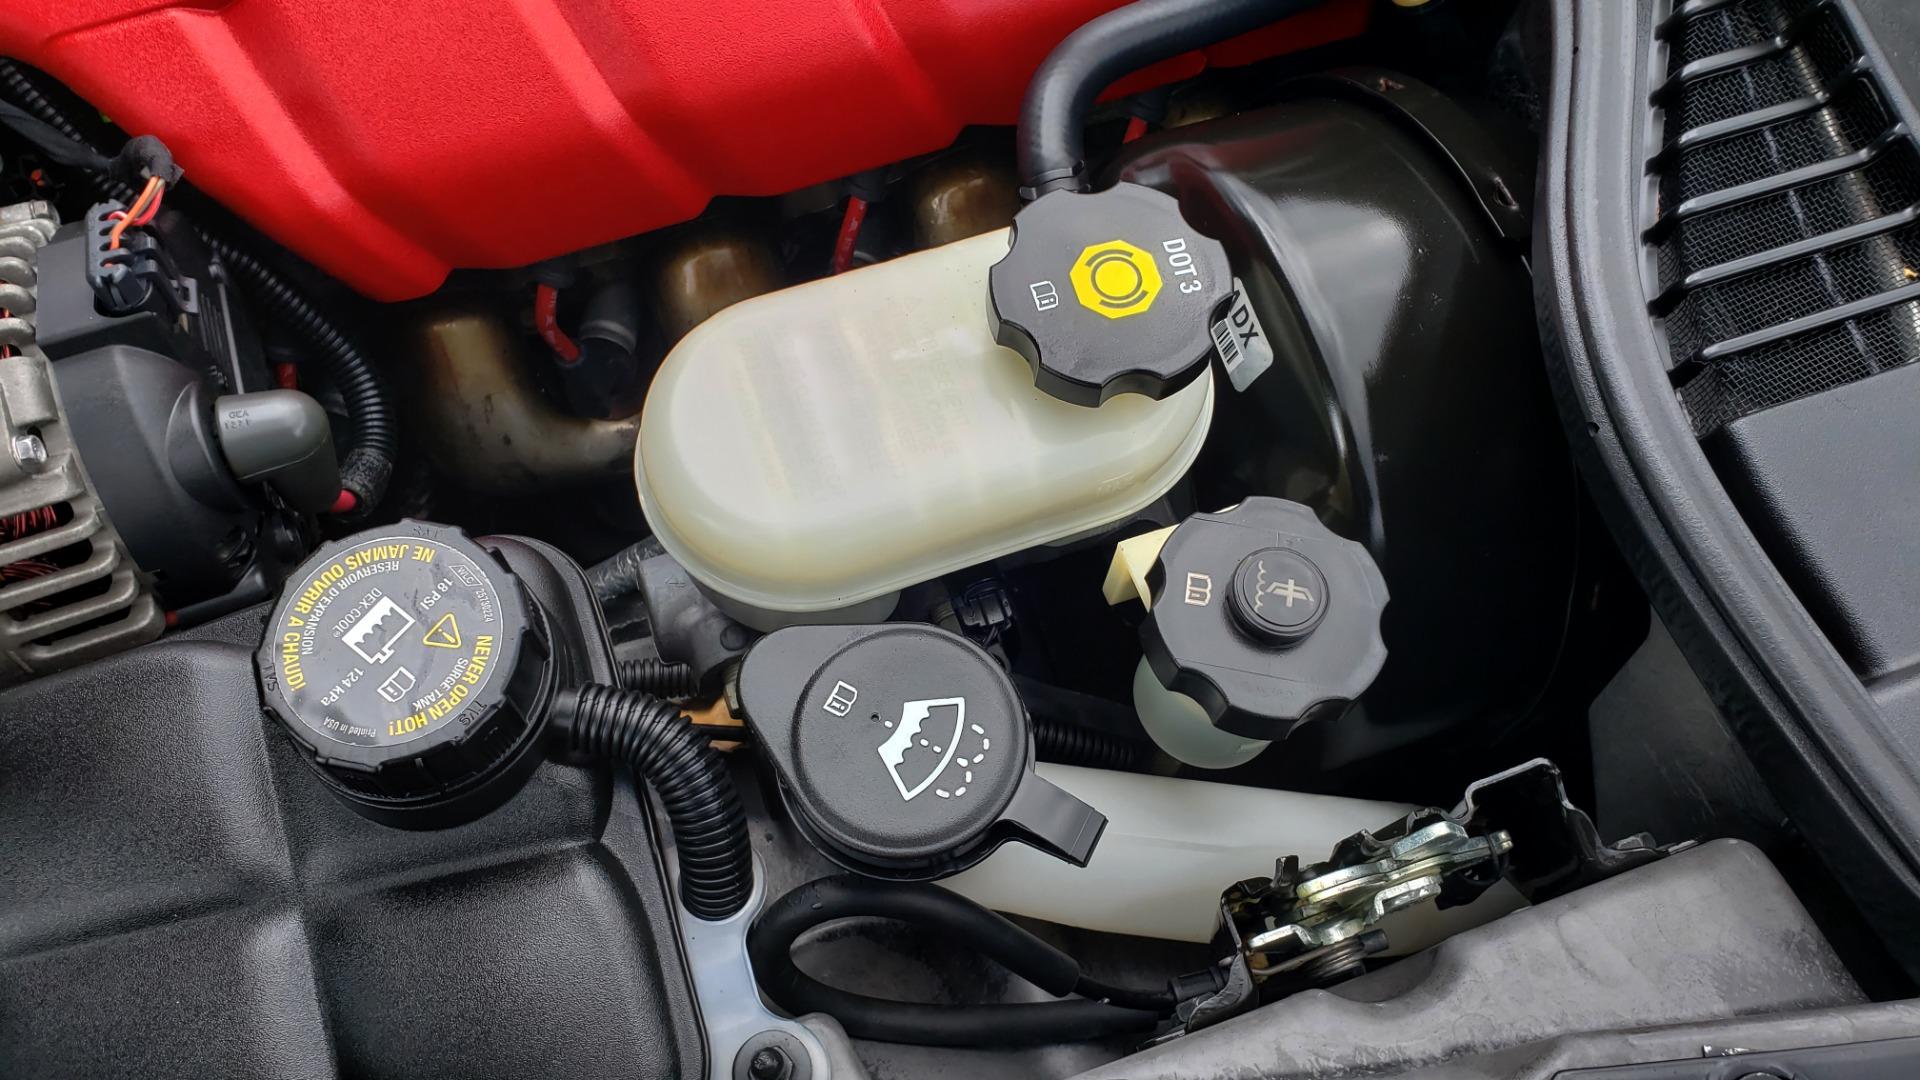 Used 2007 Chevrolet CORVETTE Z06 2LZ / 7.0L 427 V8 / 6-SPD MAN / BOSE / POLISHED WHEELS for sale Sold at Formula Imports in Charlotte NC 28227 29